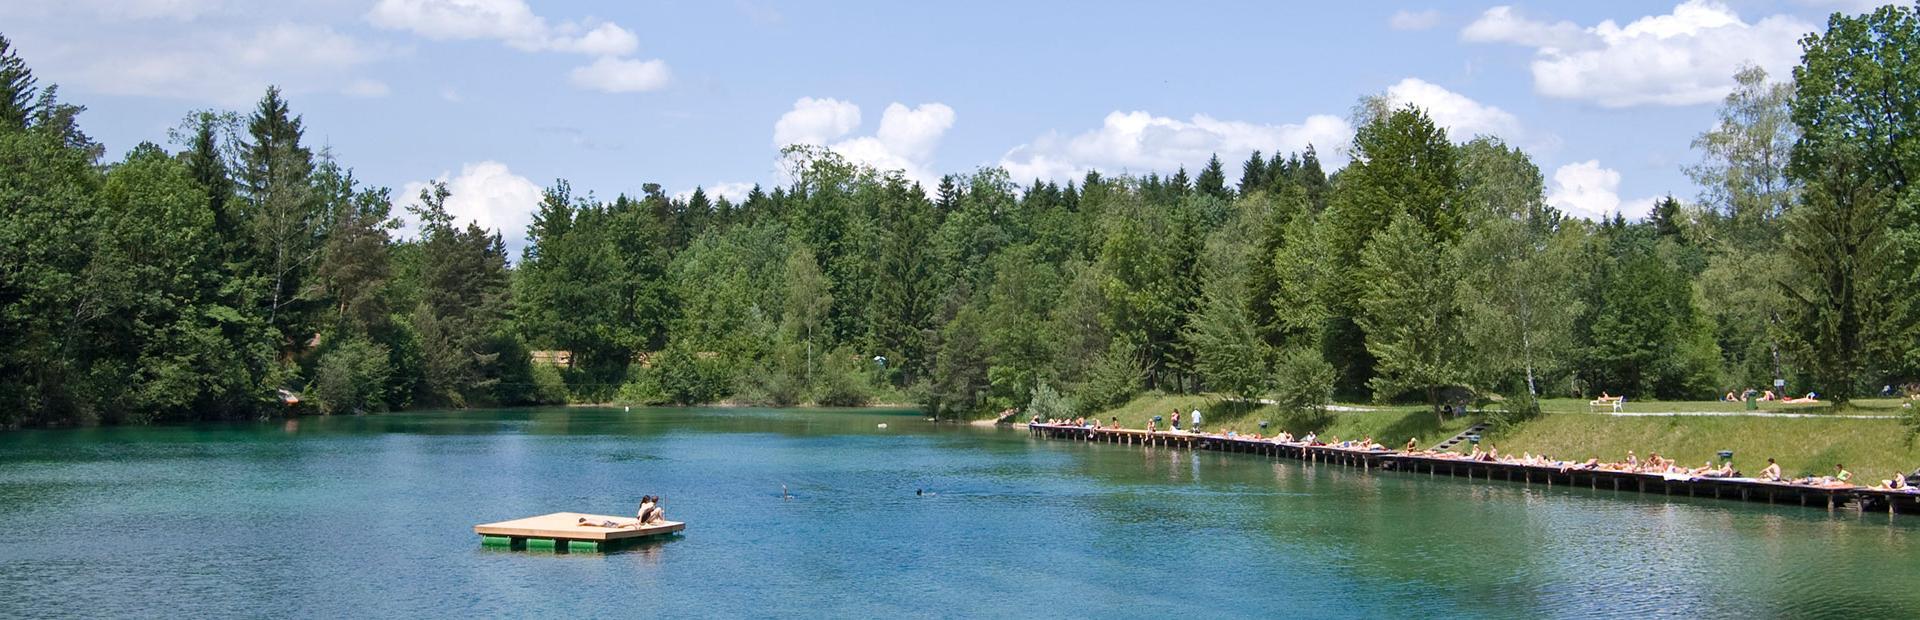 Blick über den See des Waldbades Anif